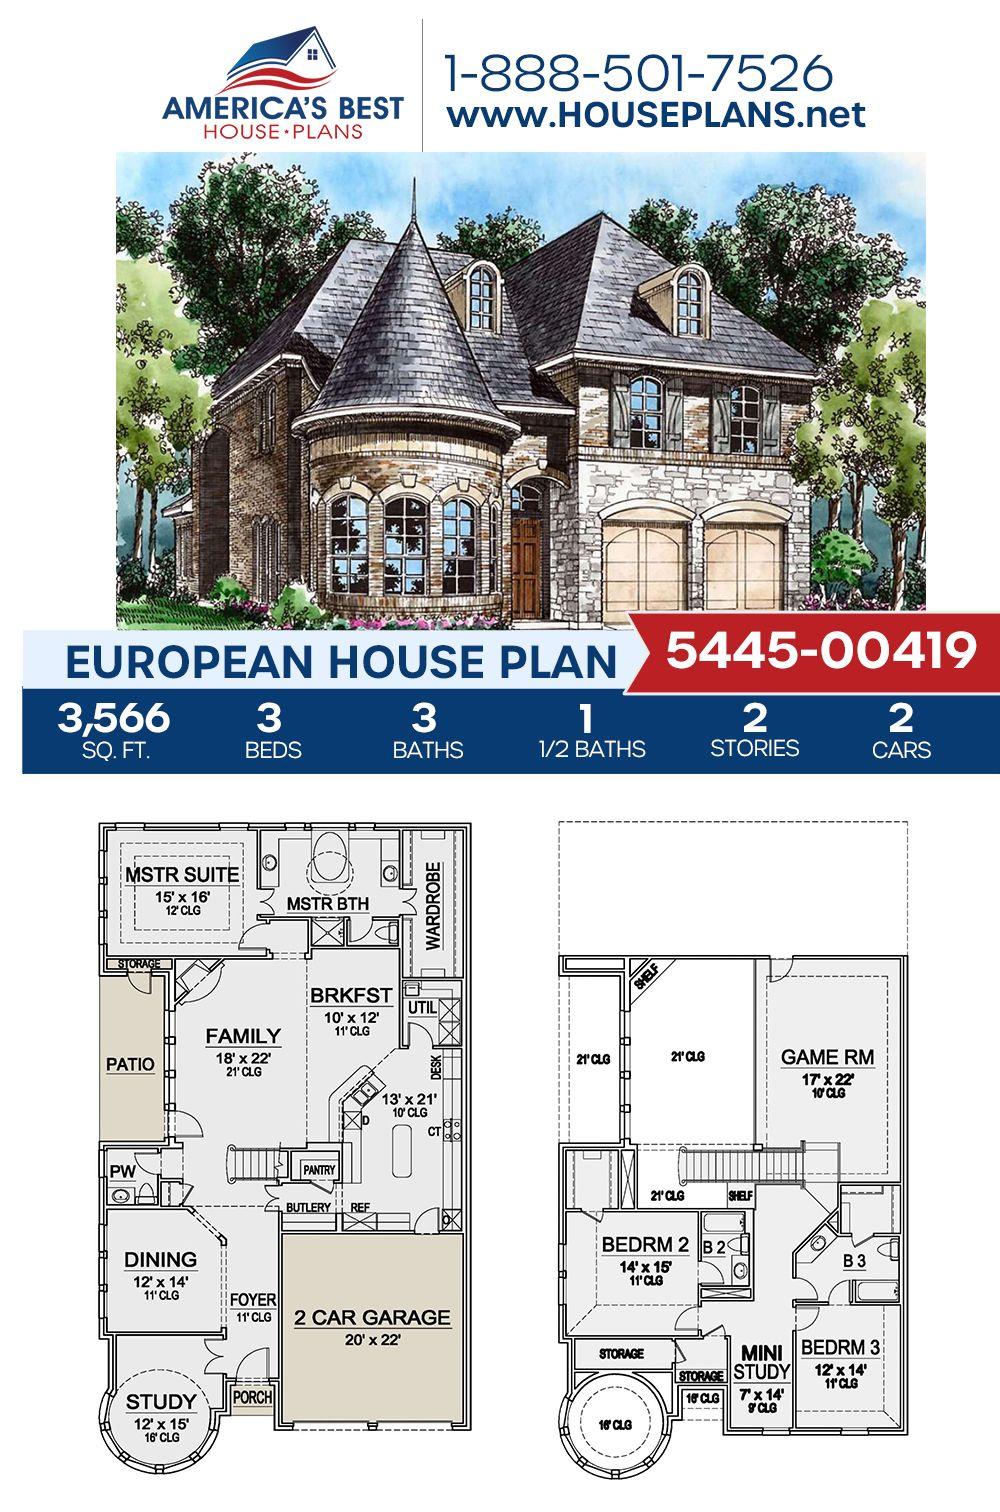 European House Plan 5445